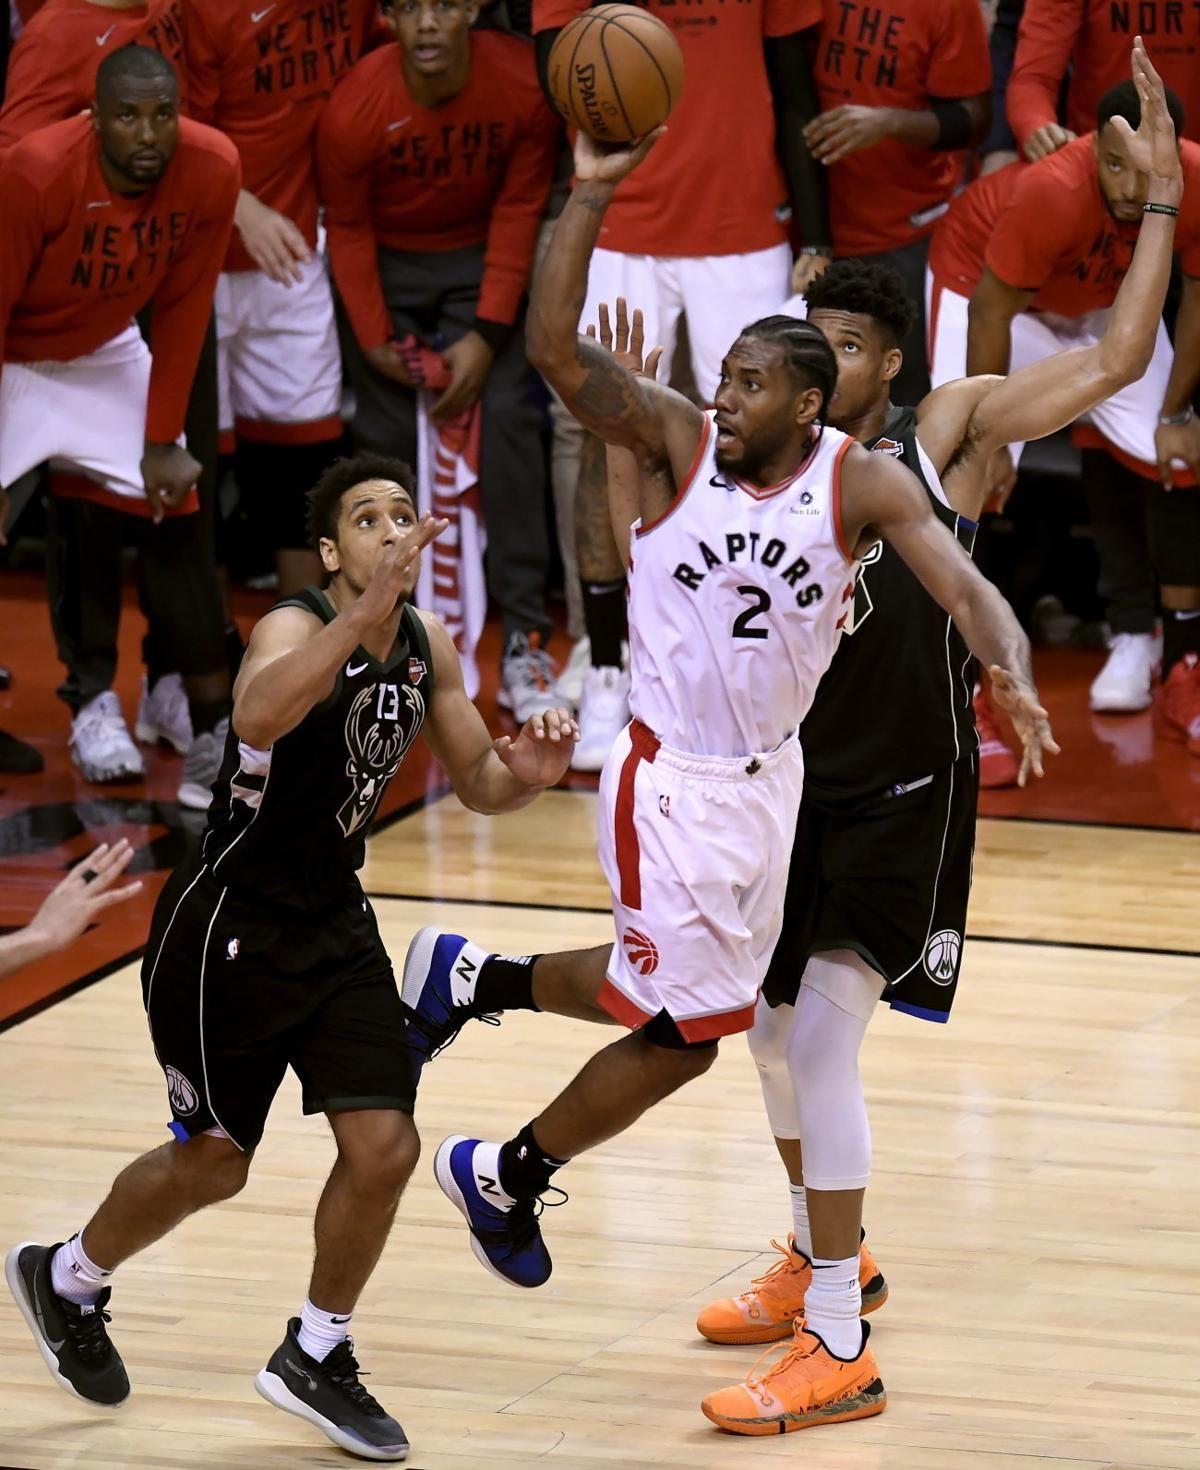 LEONARD SCORES 27 RAPTORS ADVANCE TO FIRST NBA FINALS in